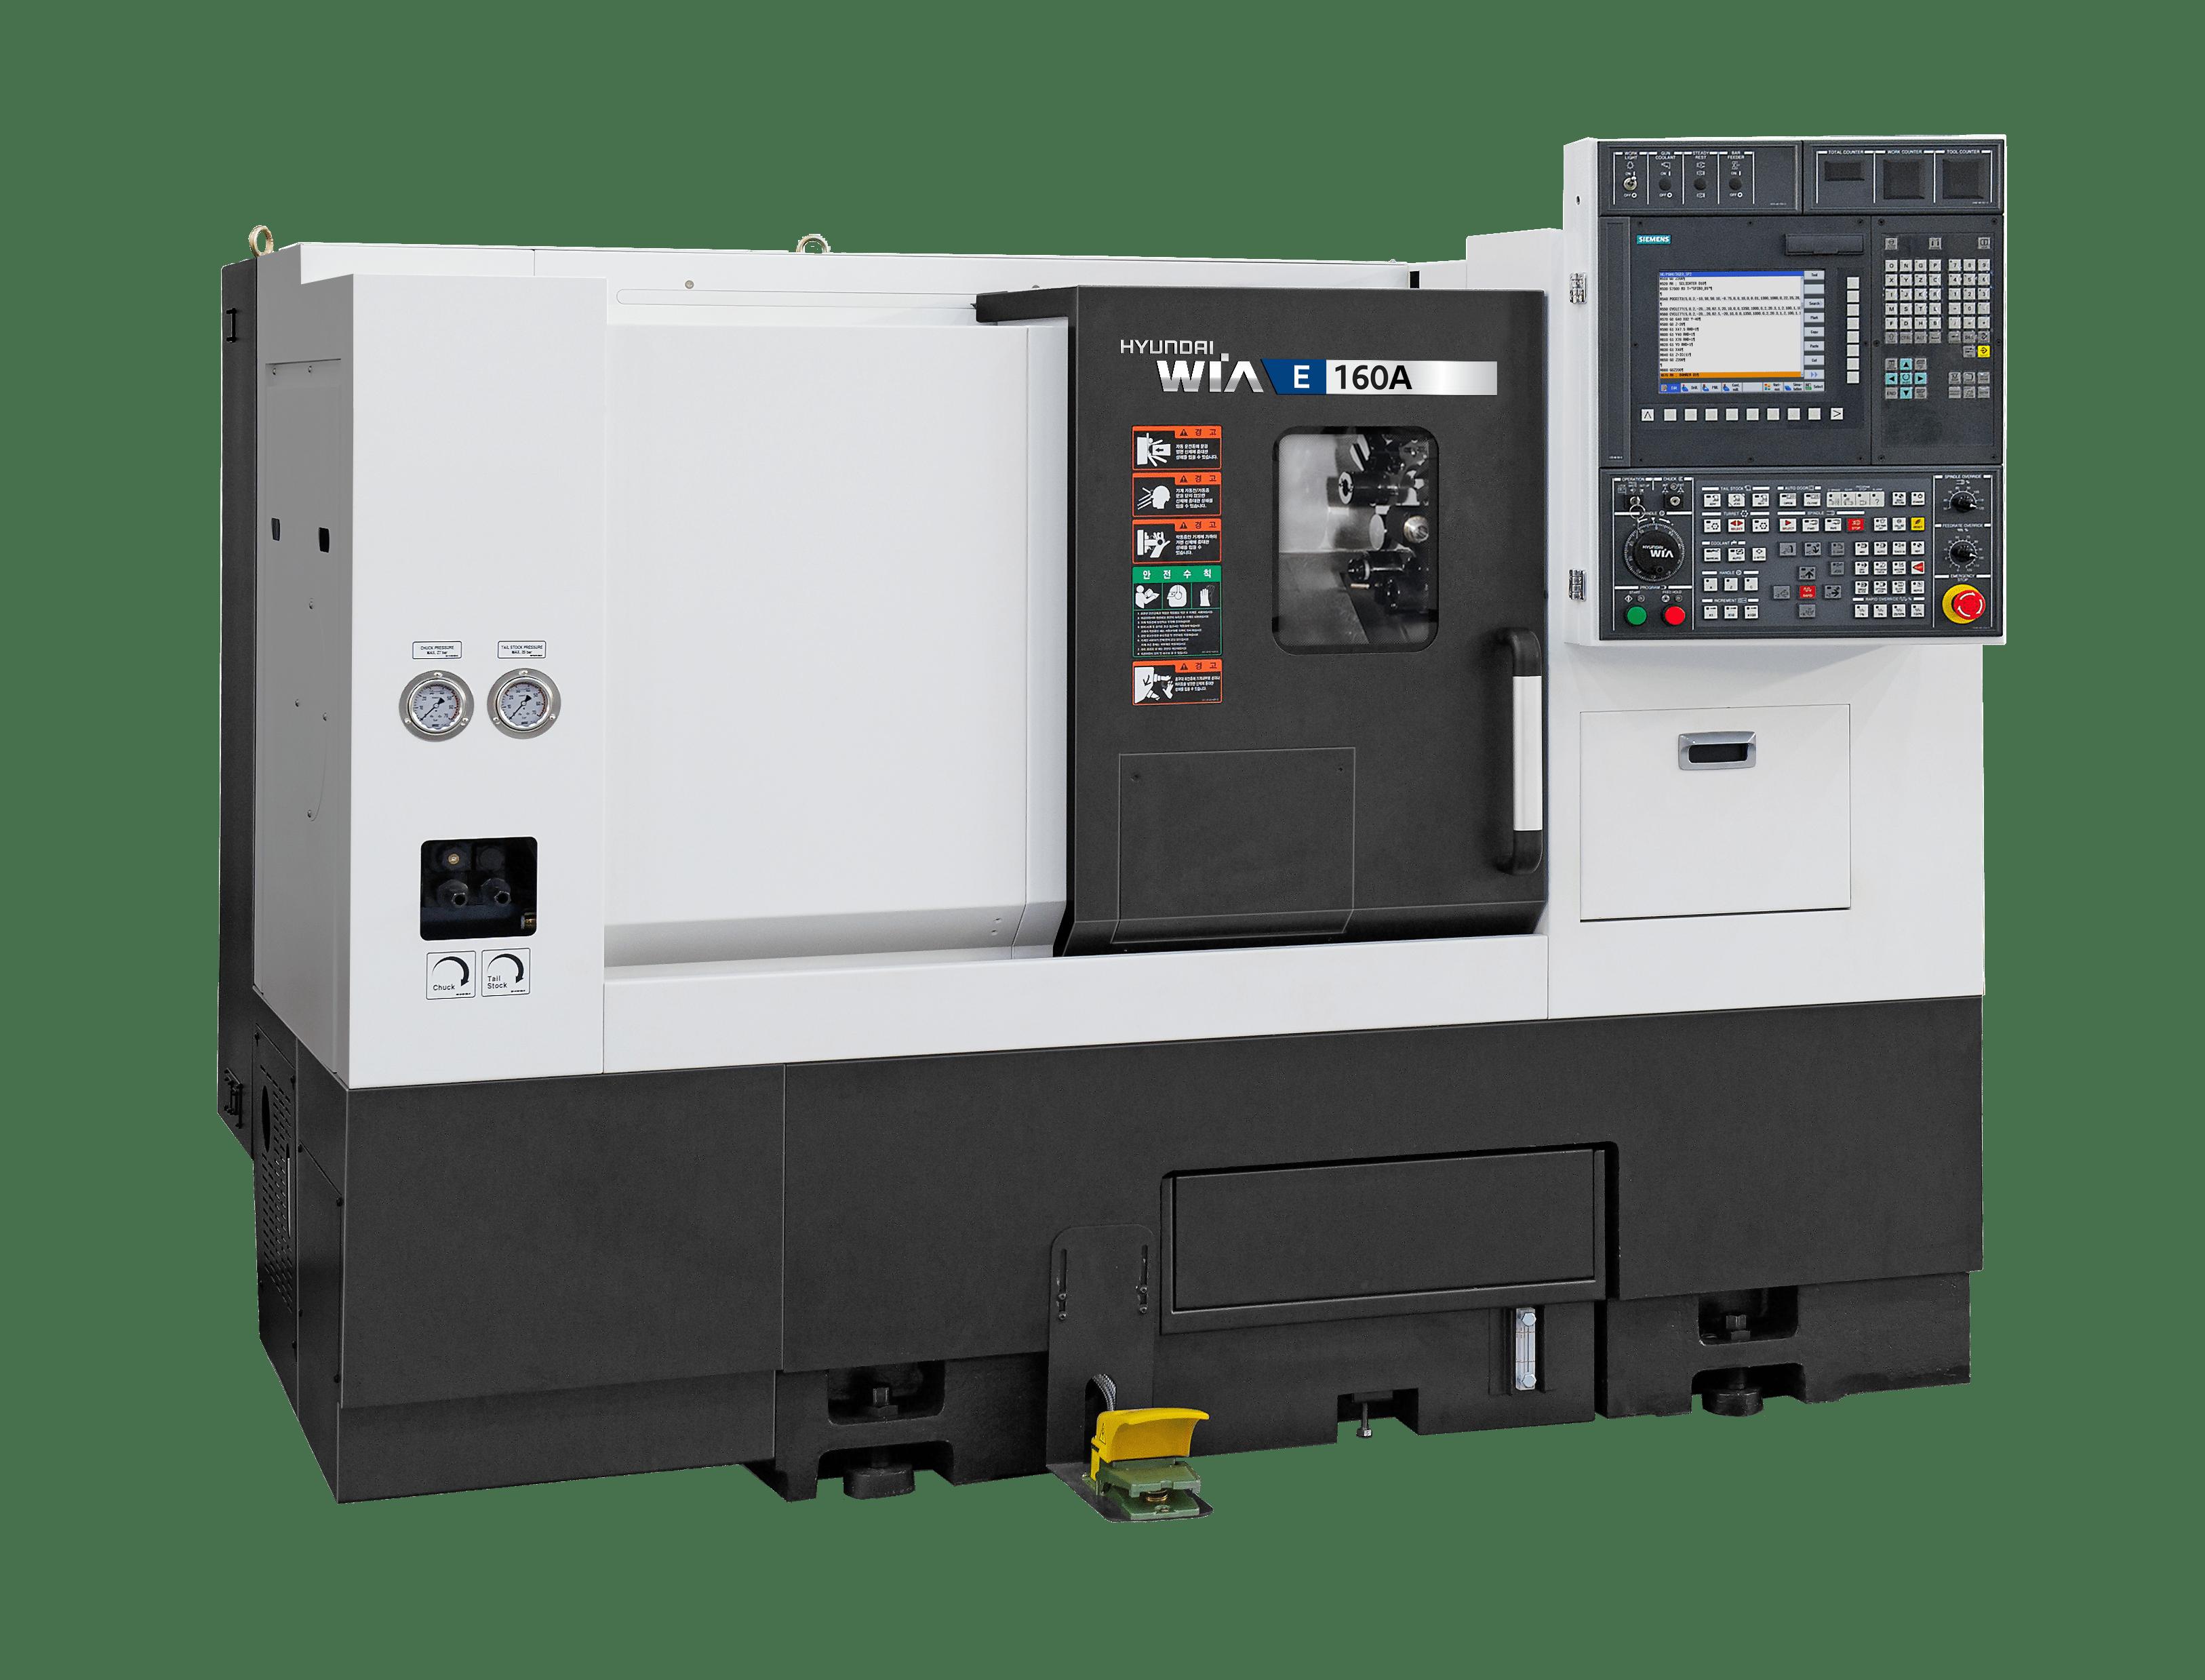 Hyundai Wia E160A/LA/LMA Compact Turning Center